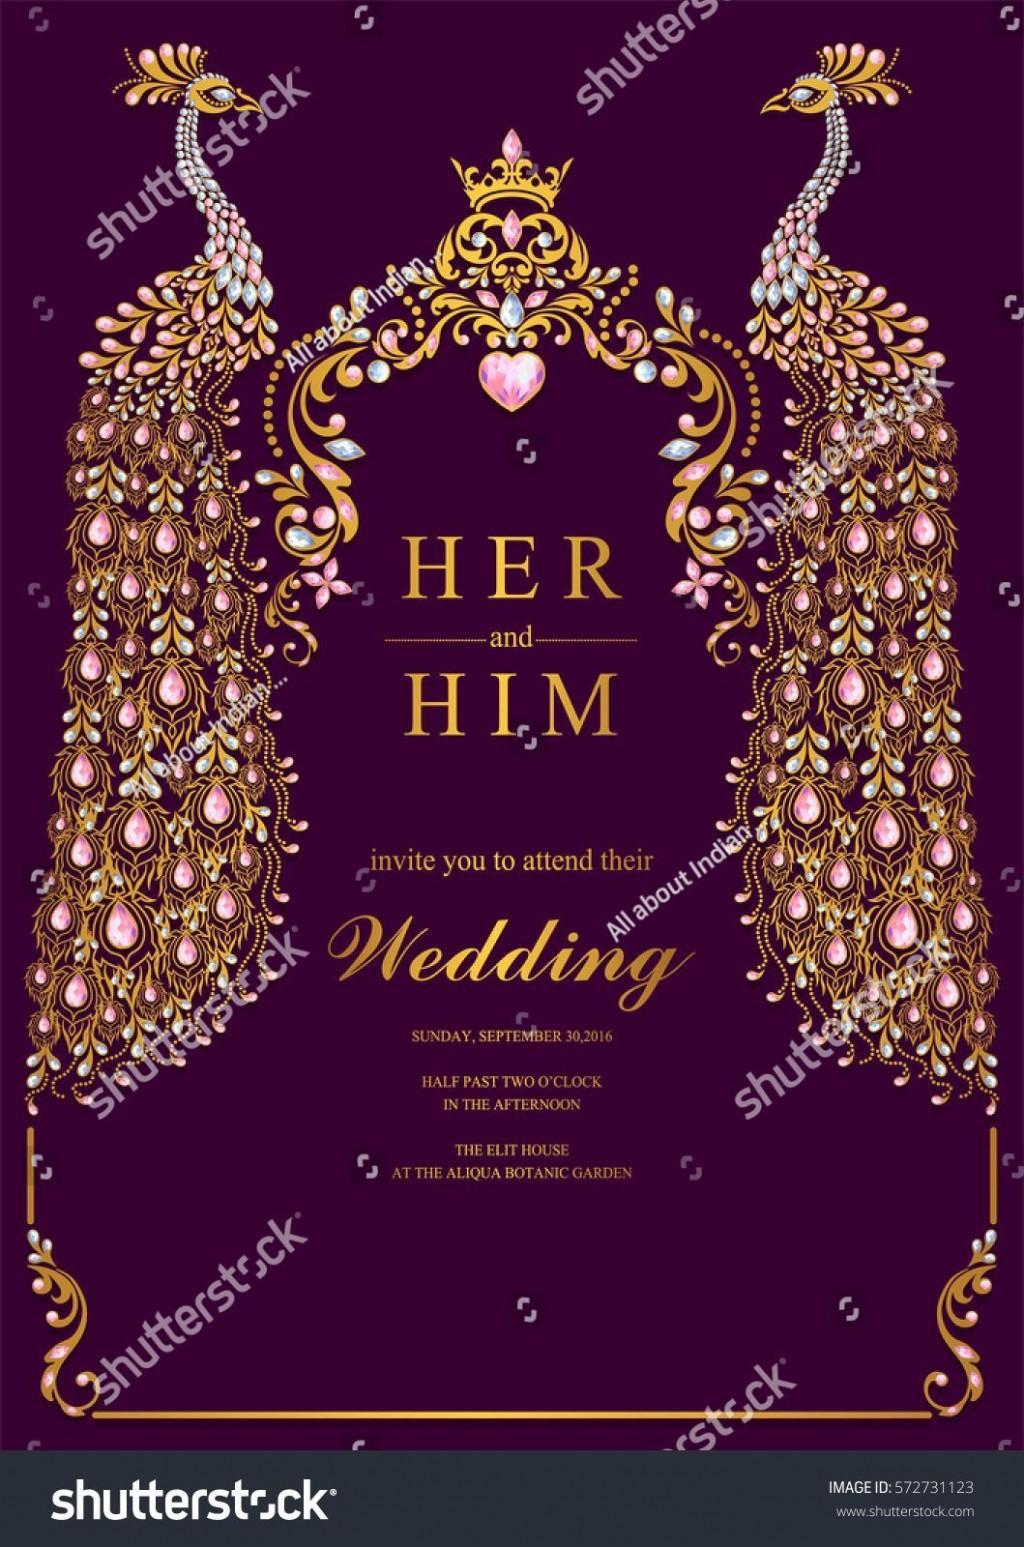 003 Unique Free Online Indian Invitation Template Image  Templates Engagement Card Maker WeddingLarge